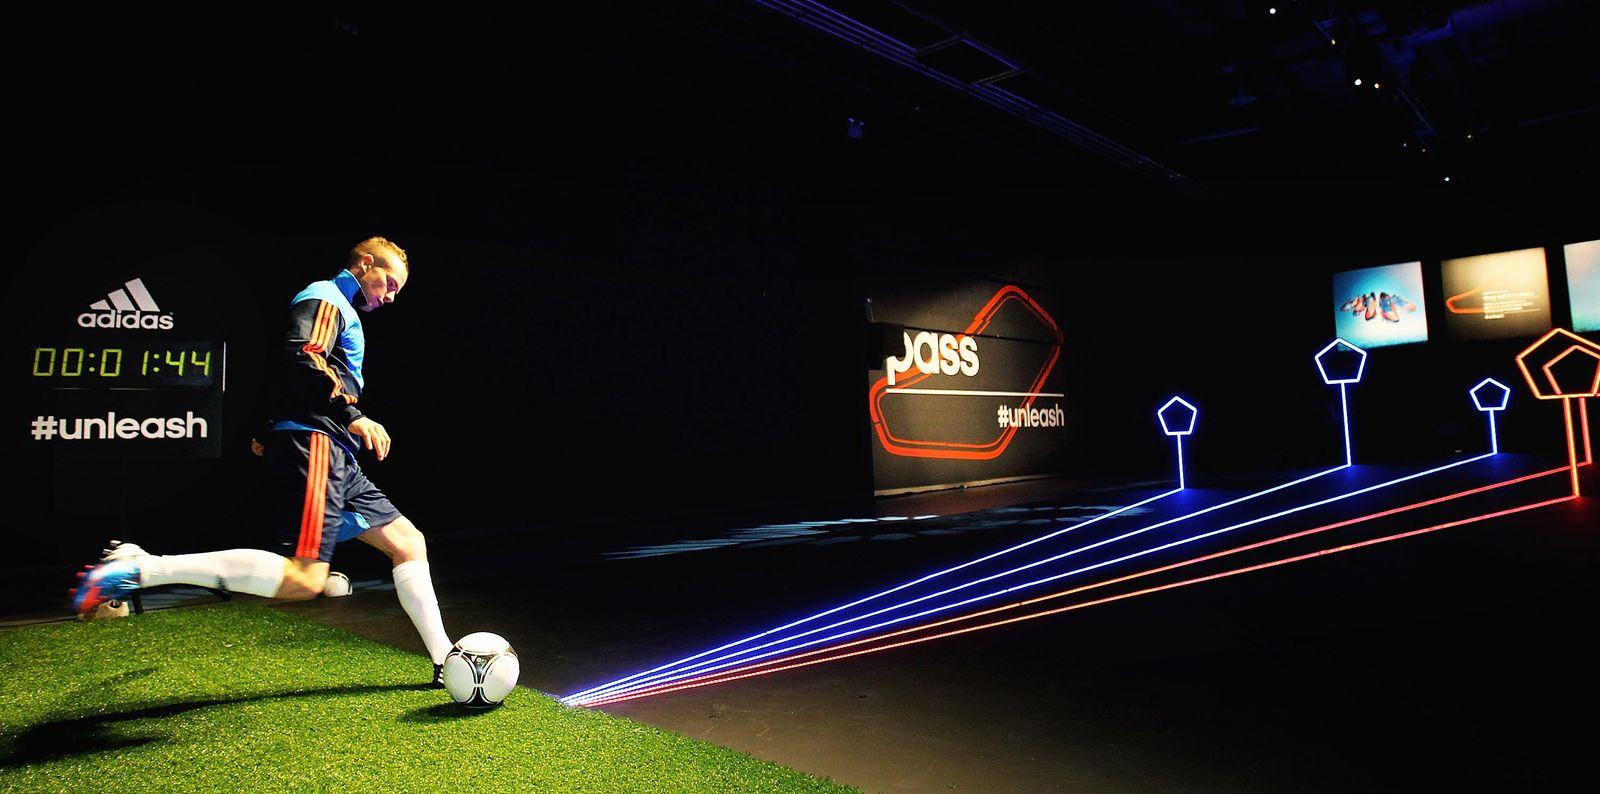 Adidas / Manchester United